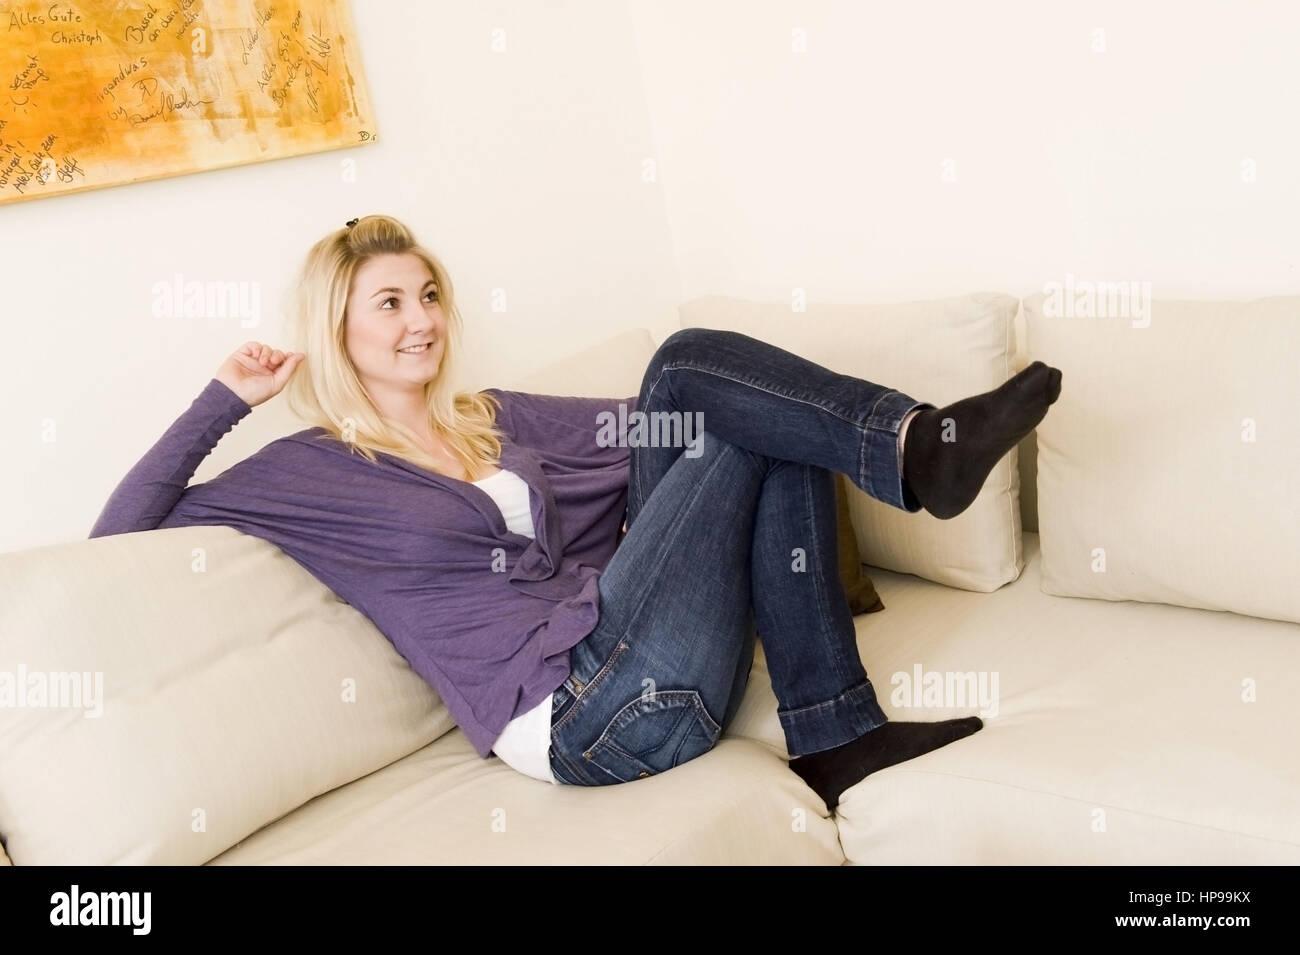 Model released , Junge blonde Frau, 24, sitzt auf einer Couch - woman sitting on couch - Stock Image